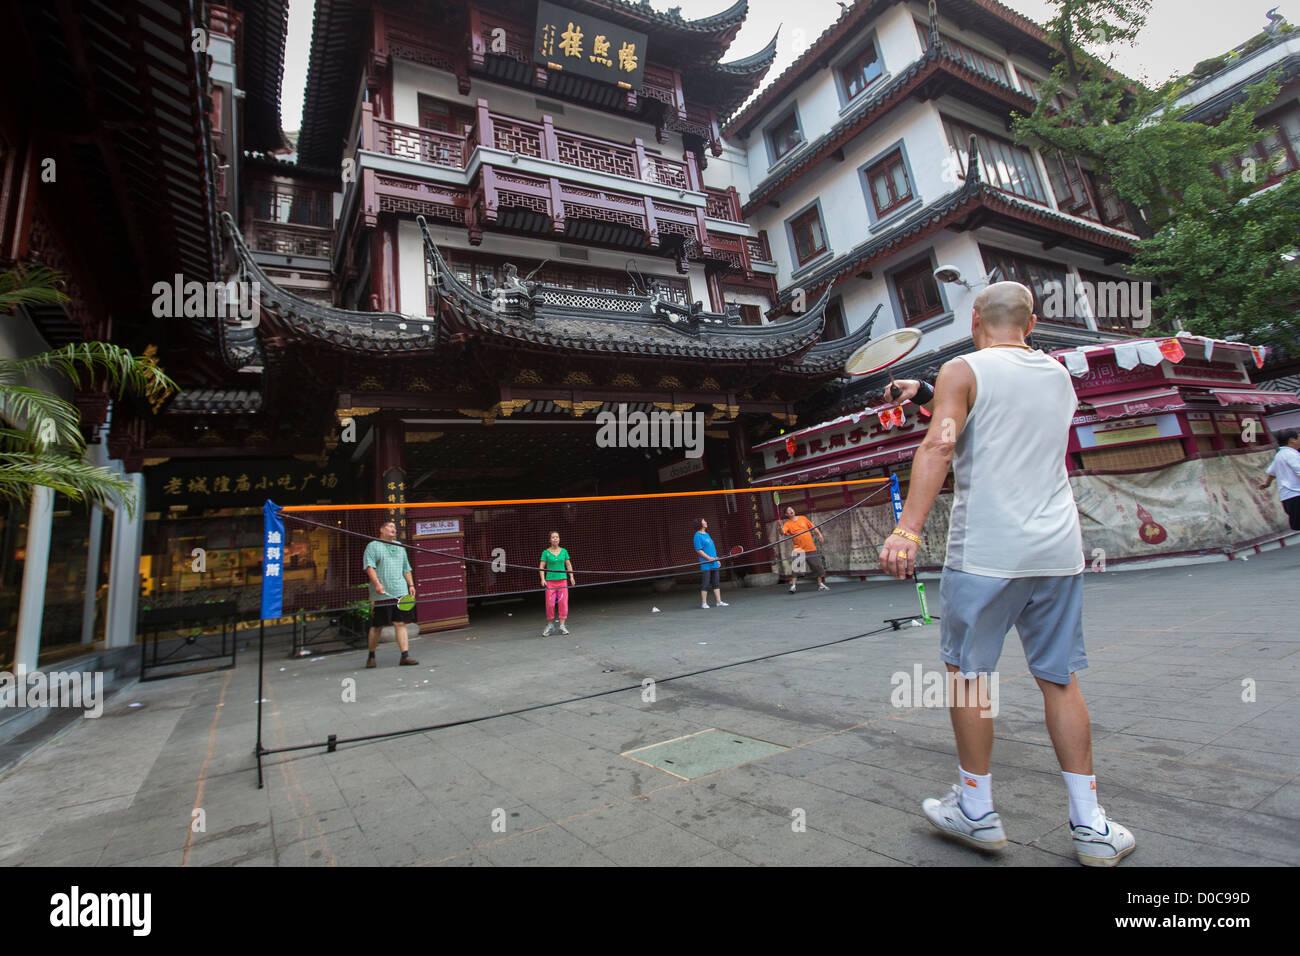 Il popolo cinese giocare a badminton in giardini Yu bazaar Shanghai, Cina Immagini Stock